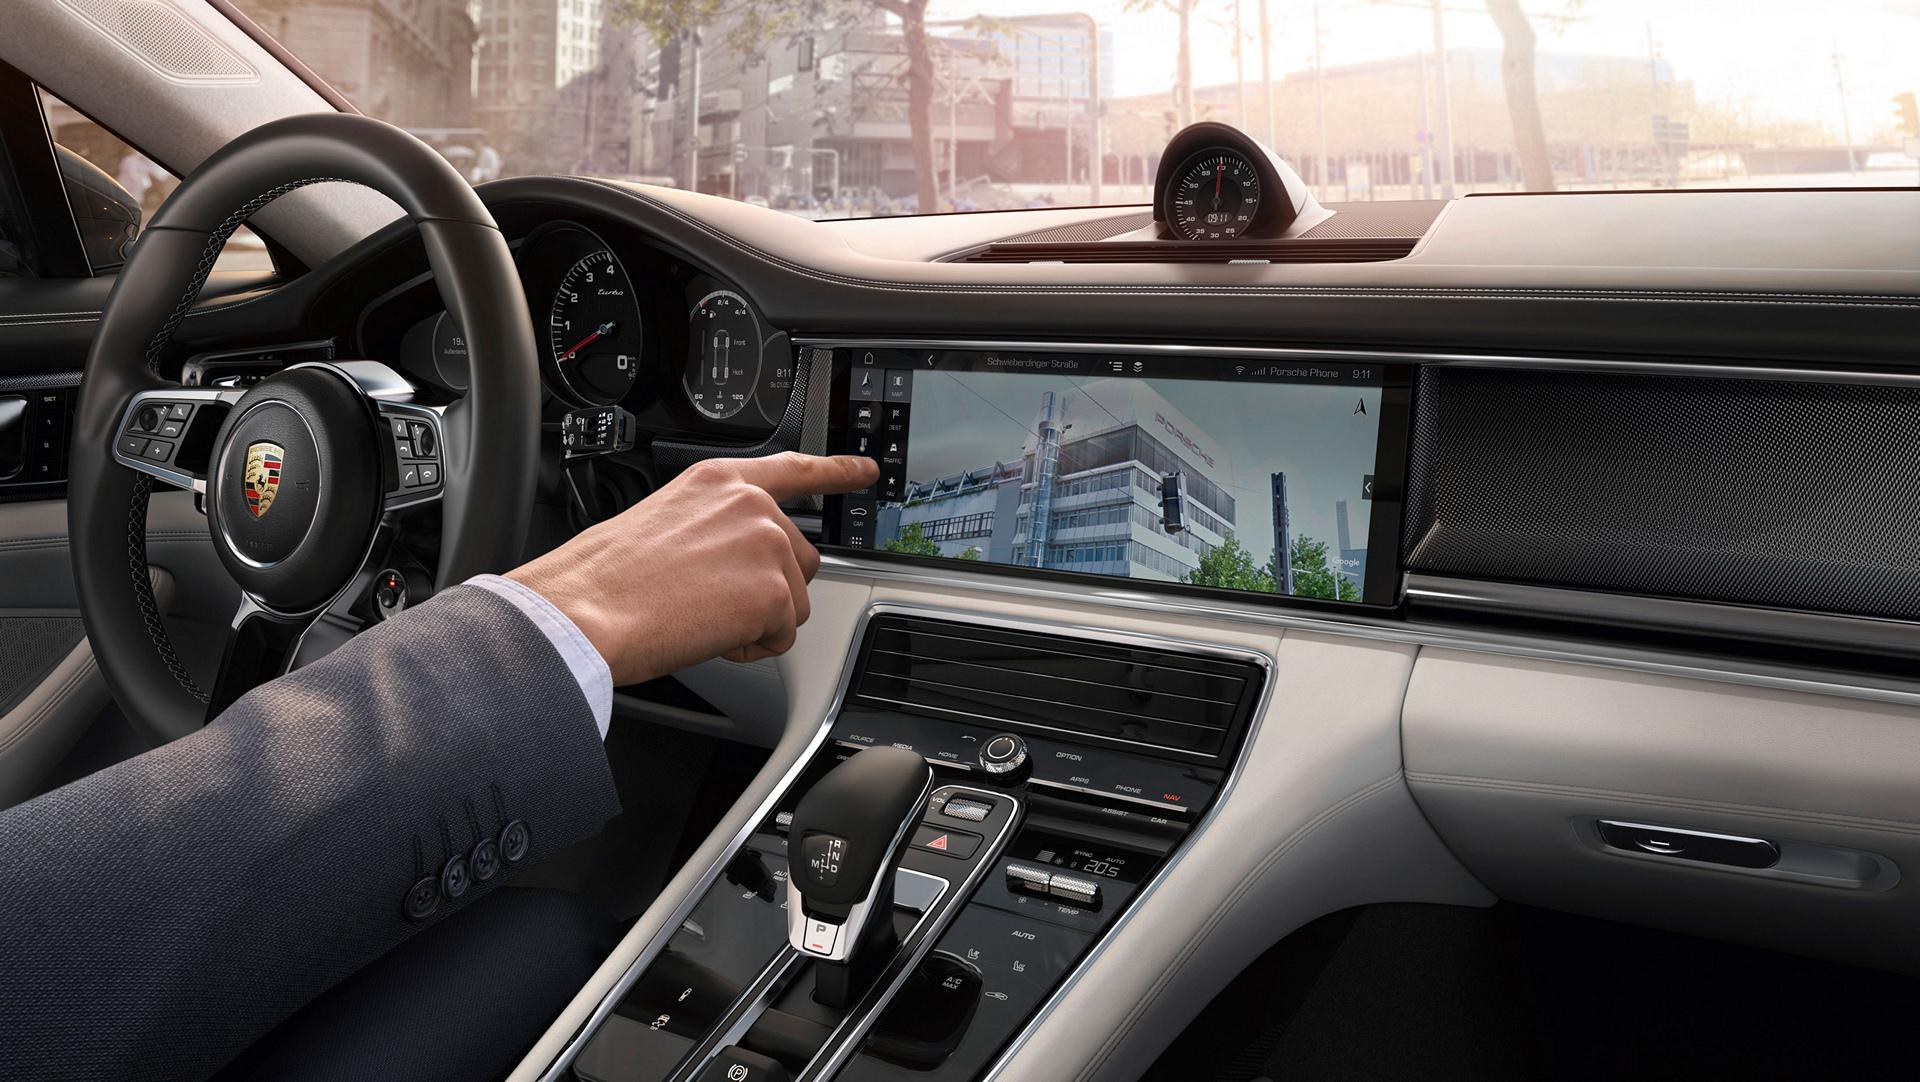 Navigation system, Google Street View, Porsche Connect © Dr. Ing. h.c. F. Porsche AG